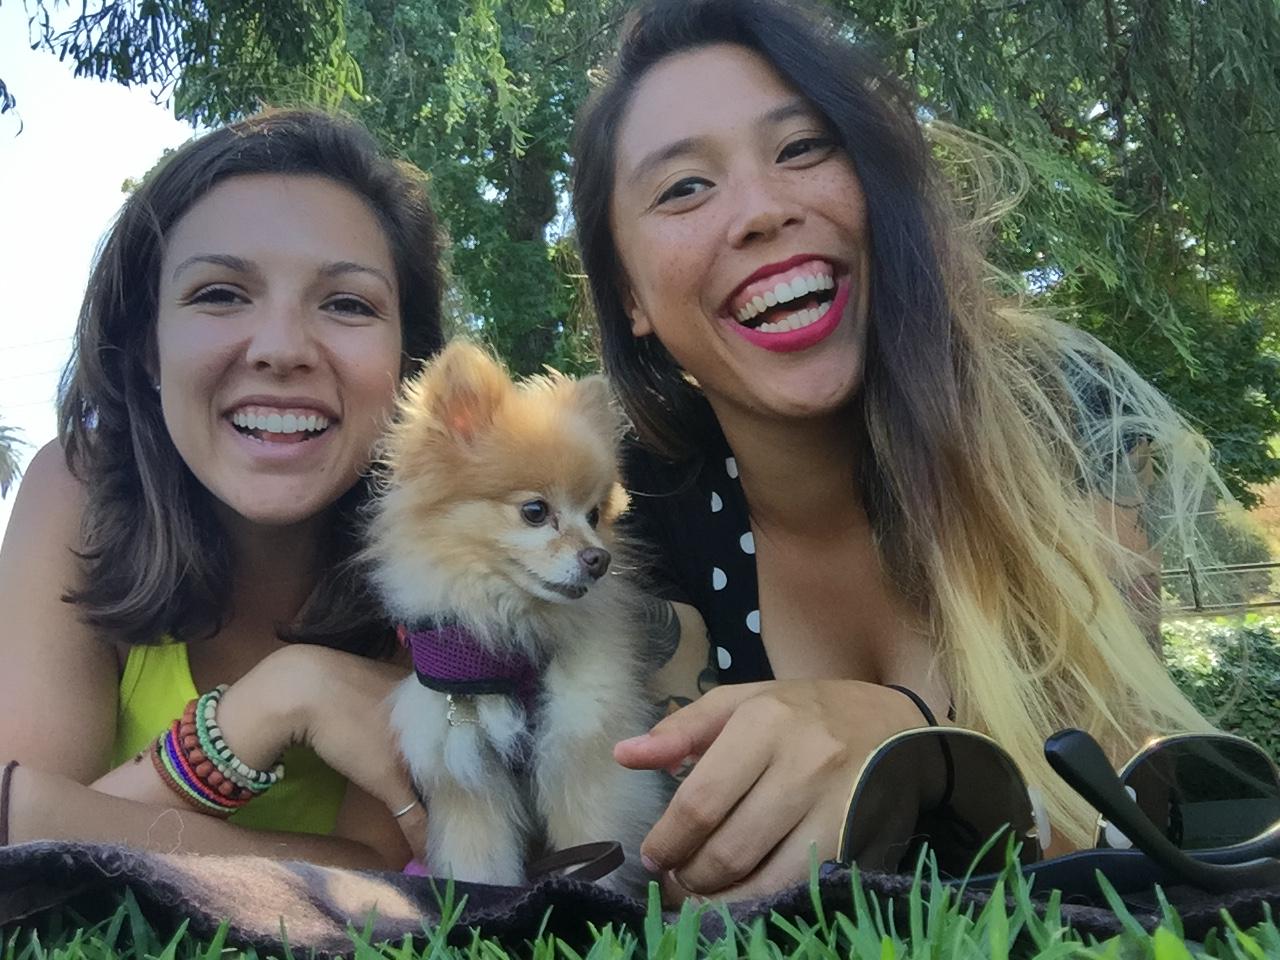 Impulse adventures with Leah & Lil Dau